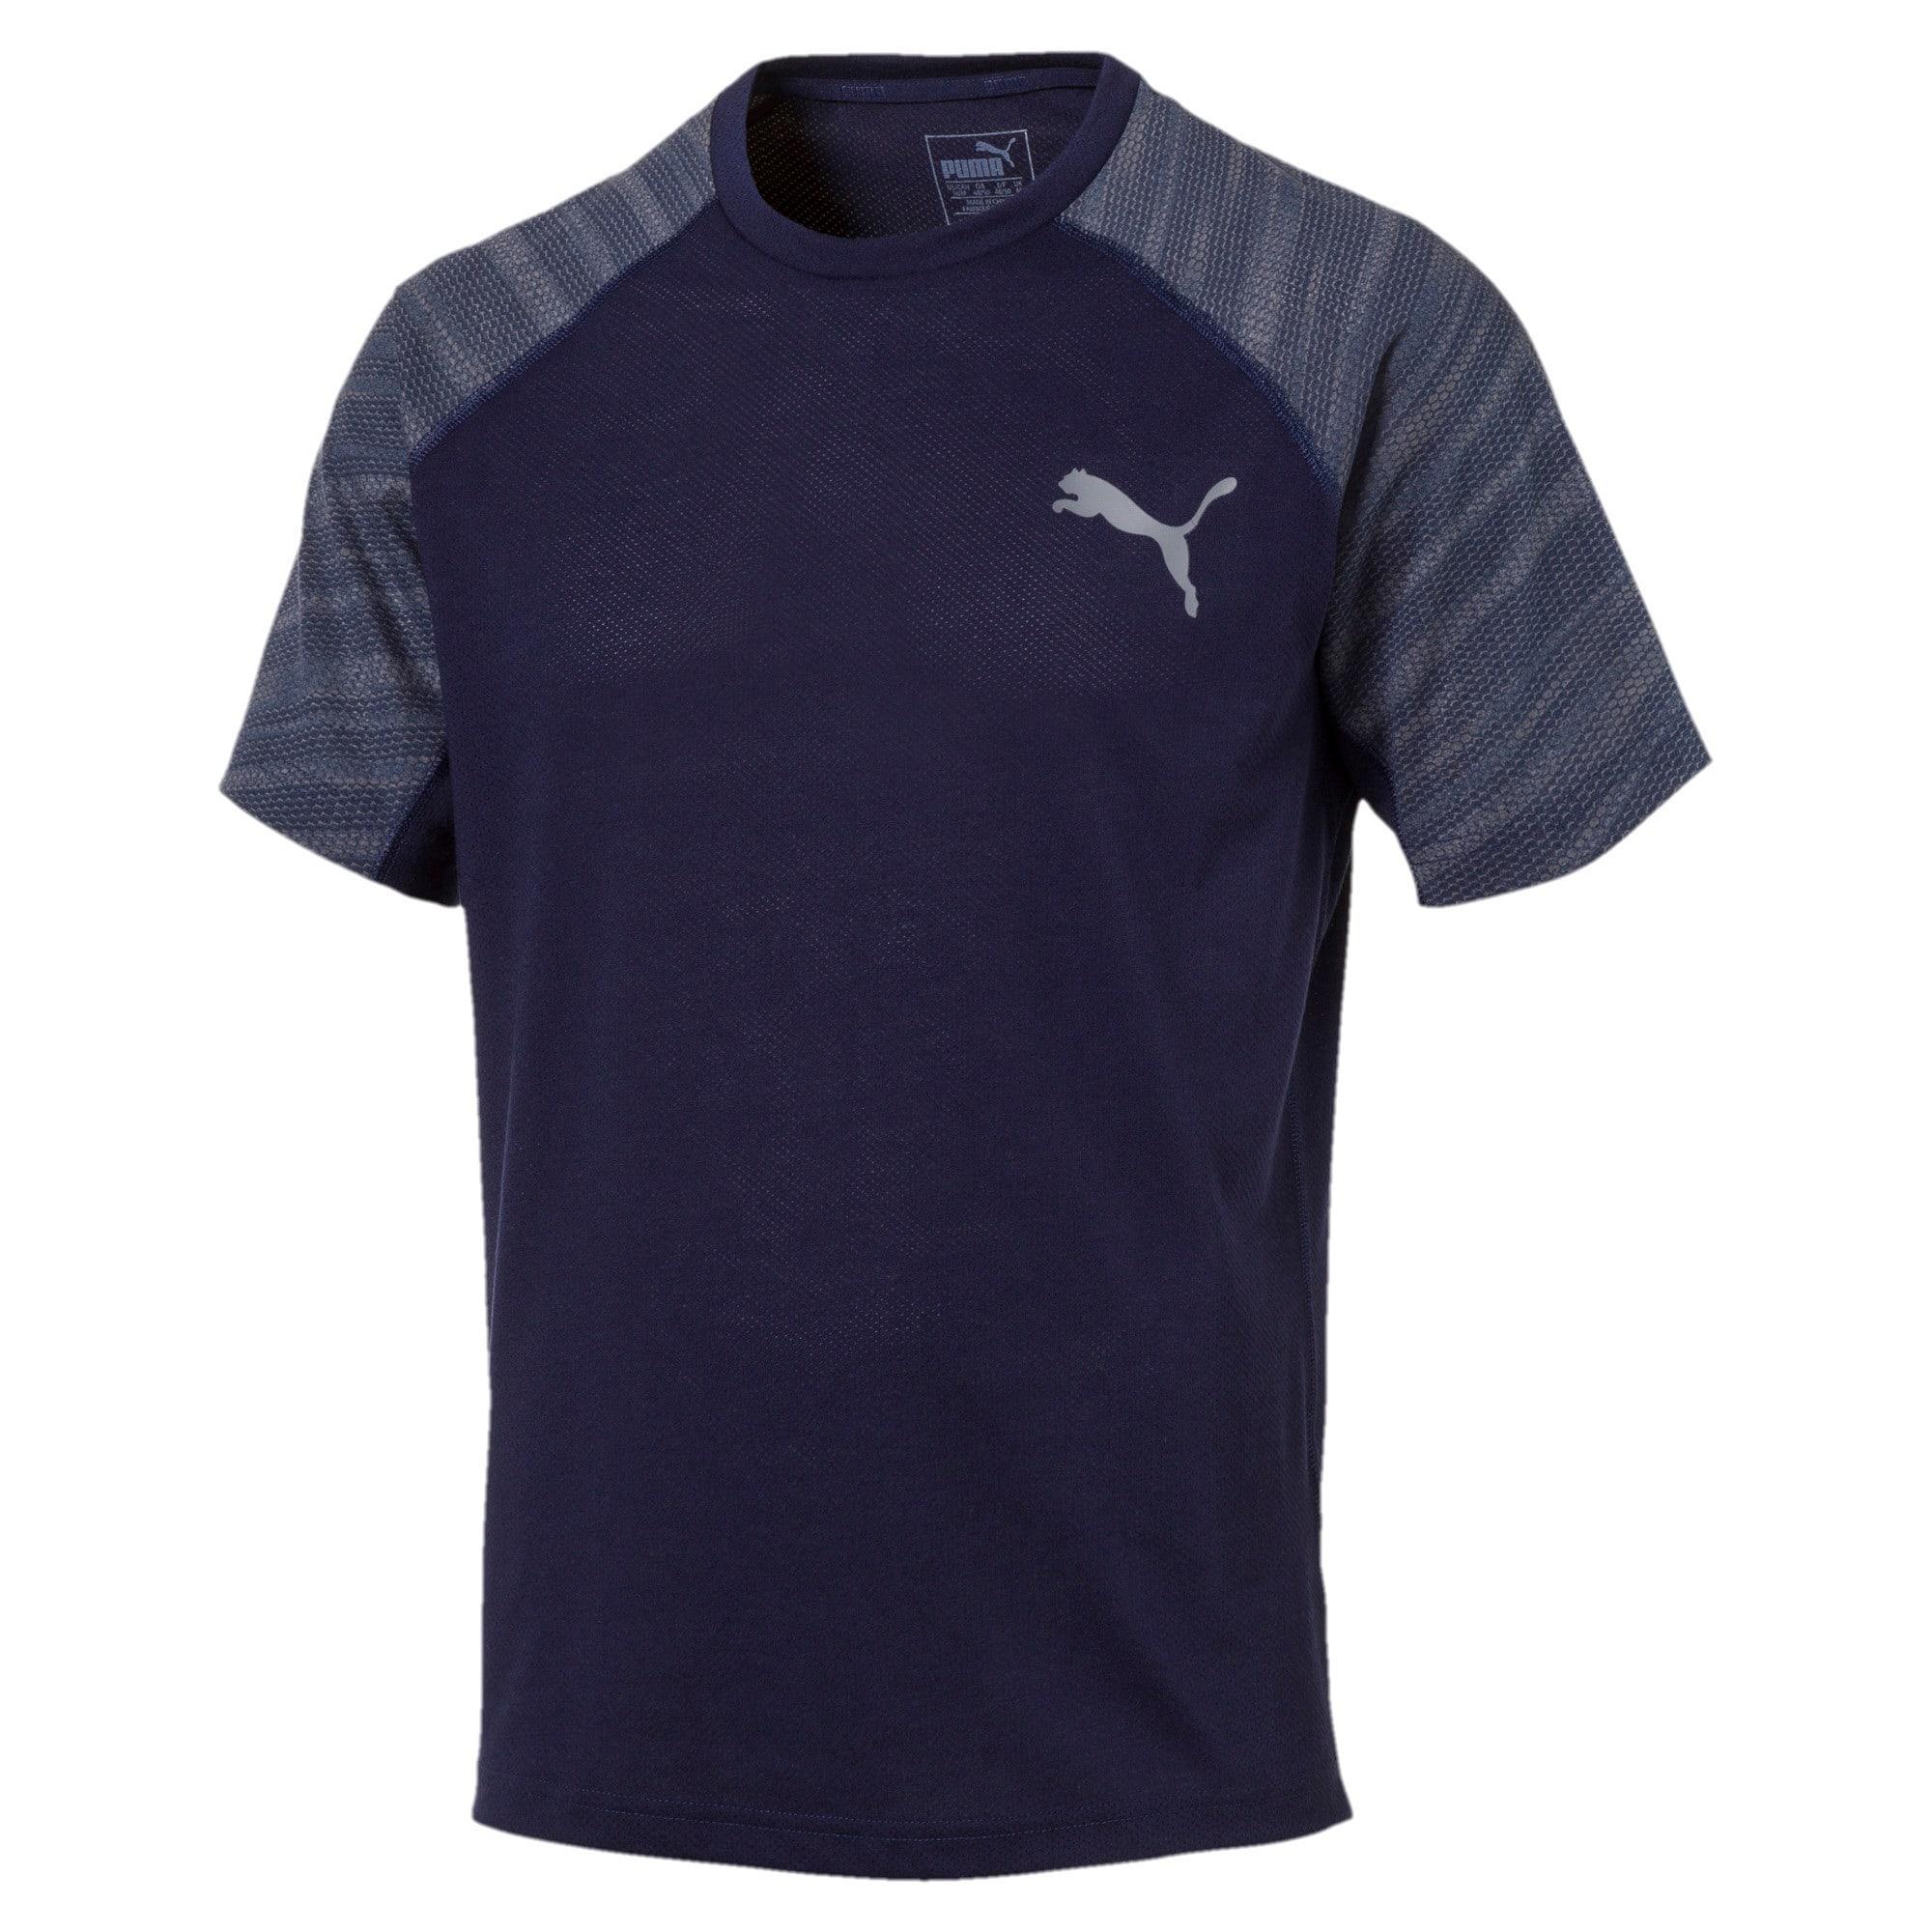 Thumbnail 4 of Active Training Dri-Release® T-Shirt, Peacoat, medium-IND